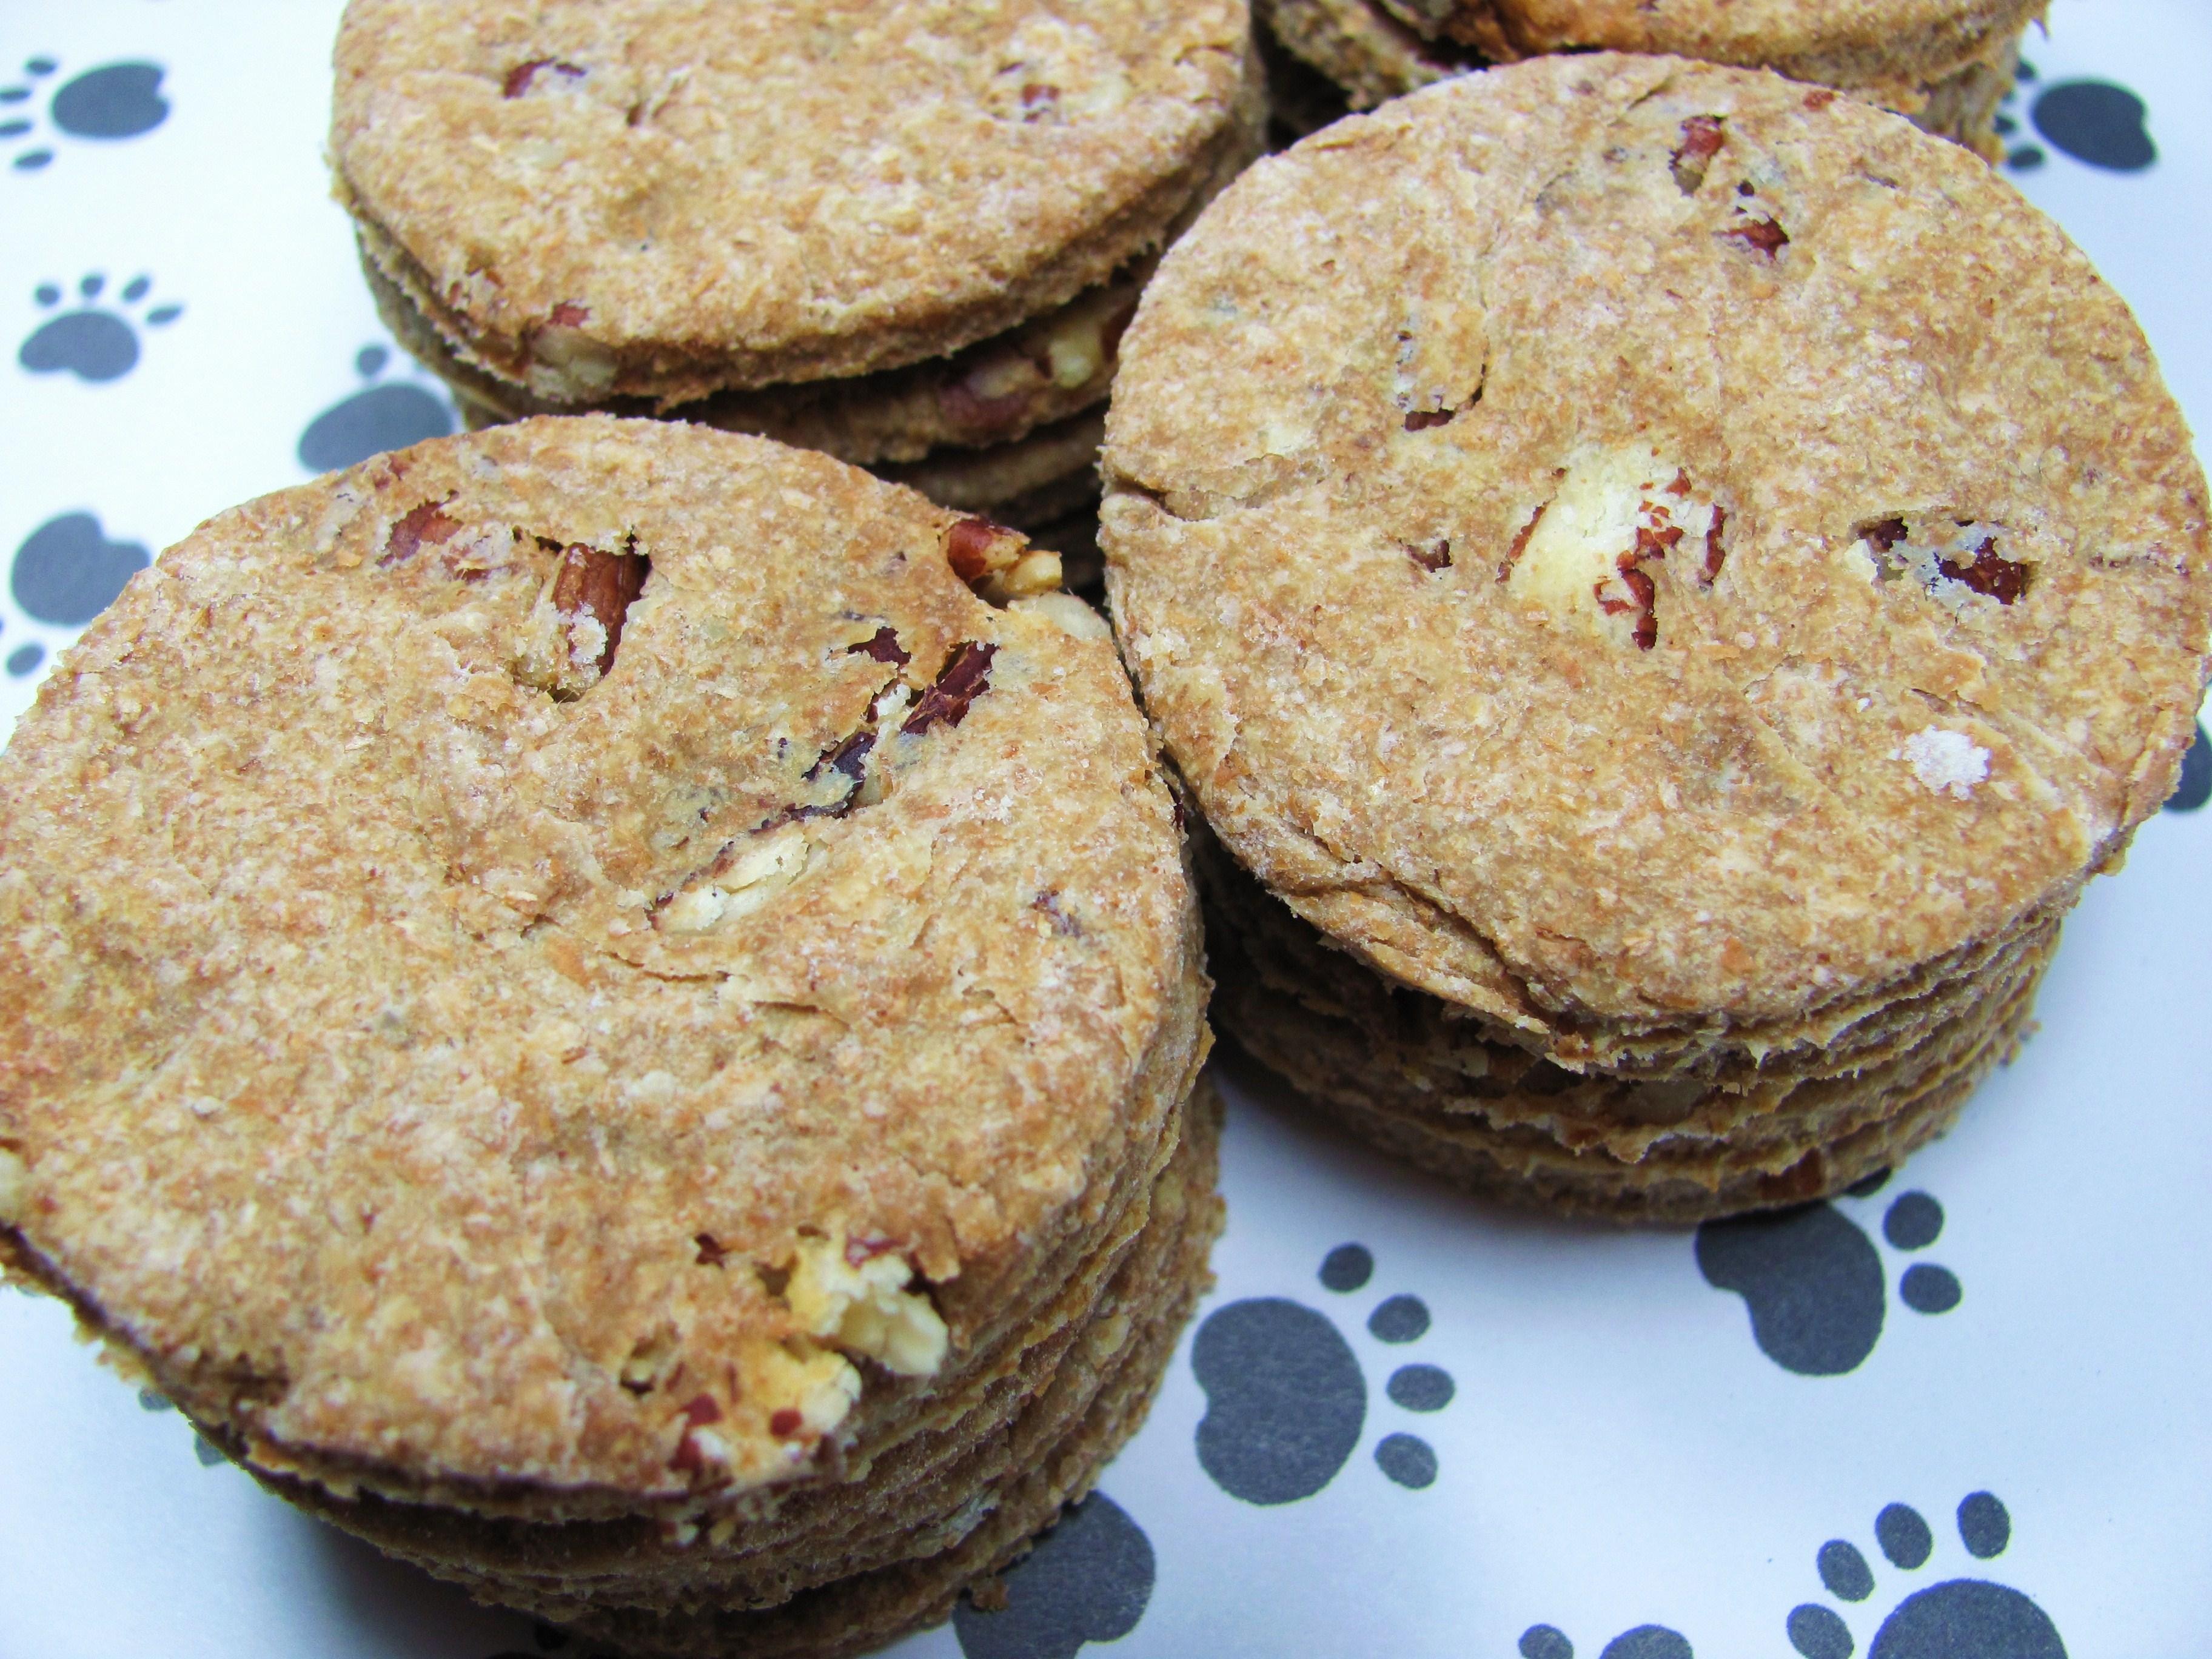 Pecan Pie Dog Treat/Biscuit Recipe